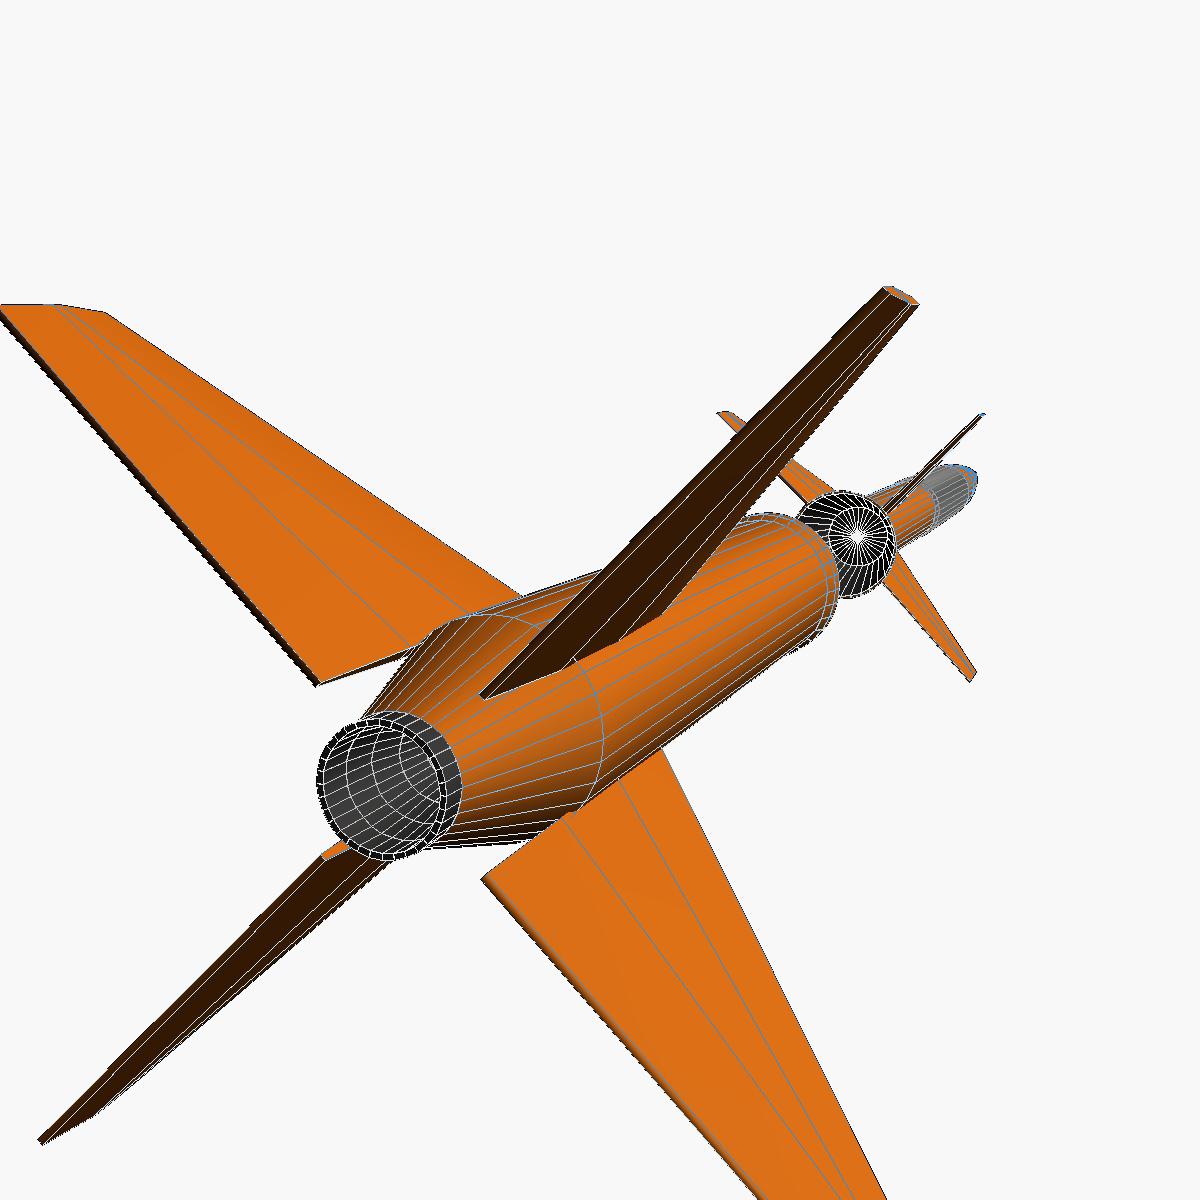 gamma centauro rocket 3d model 3ds dxf fbx blend cob dae x obj 218207